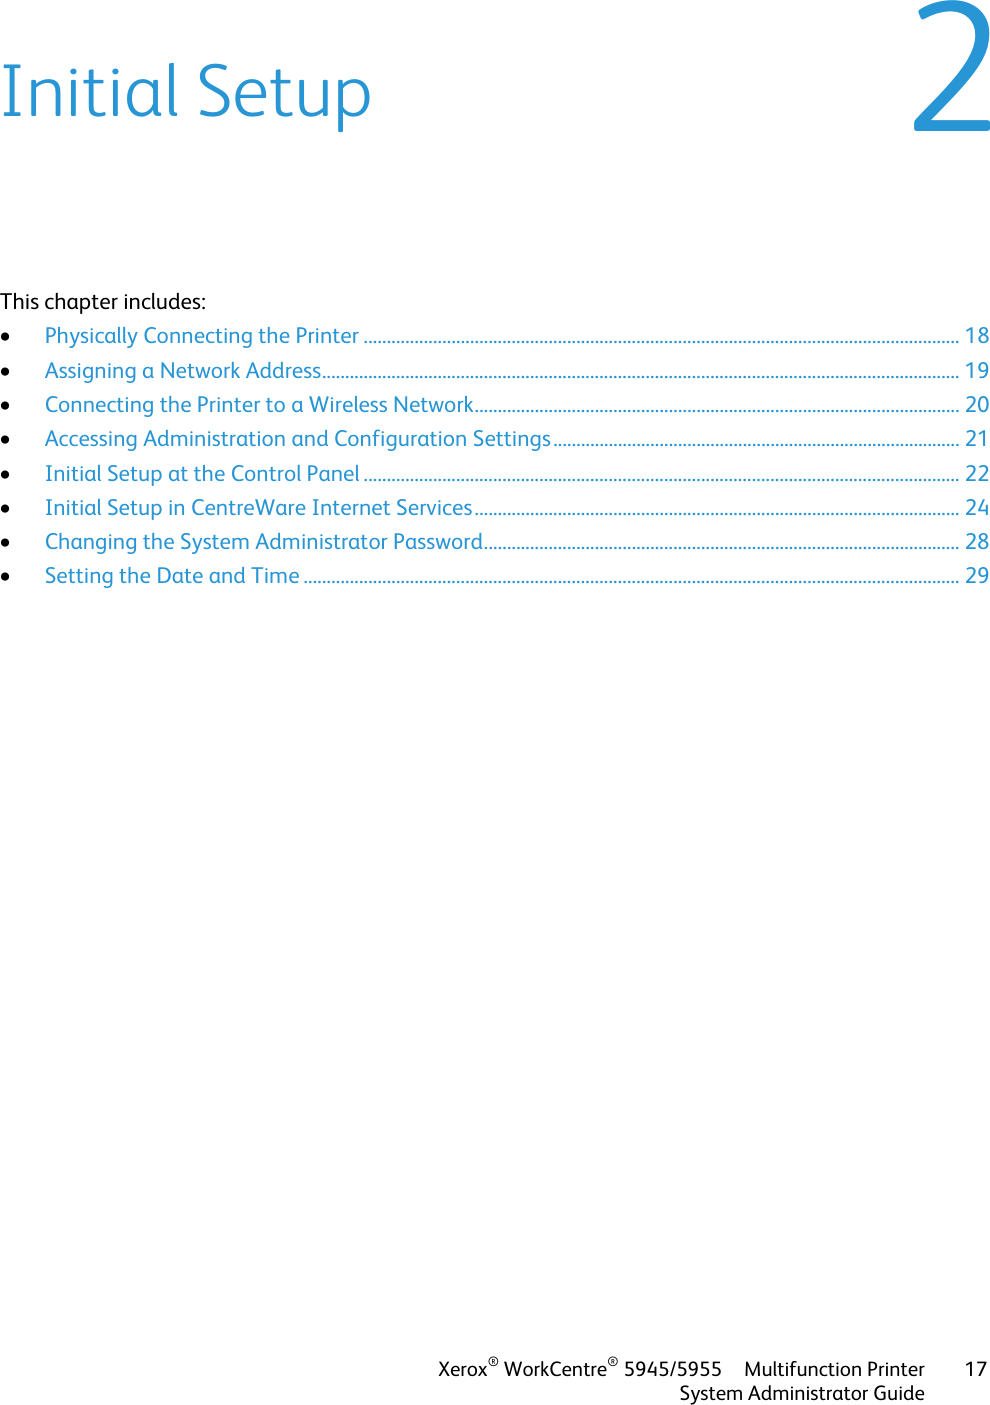 Xerox Workcentre 5945 5955 Administrators Guide Xerox